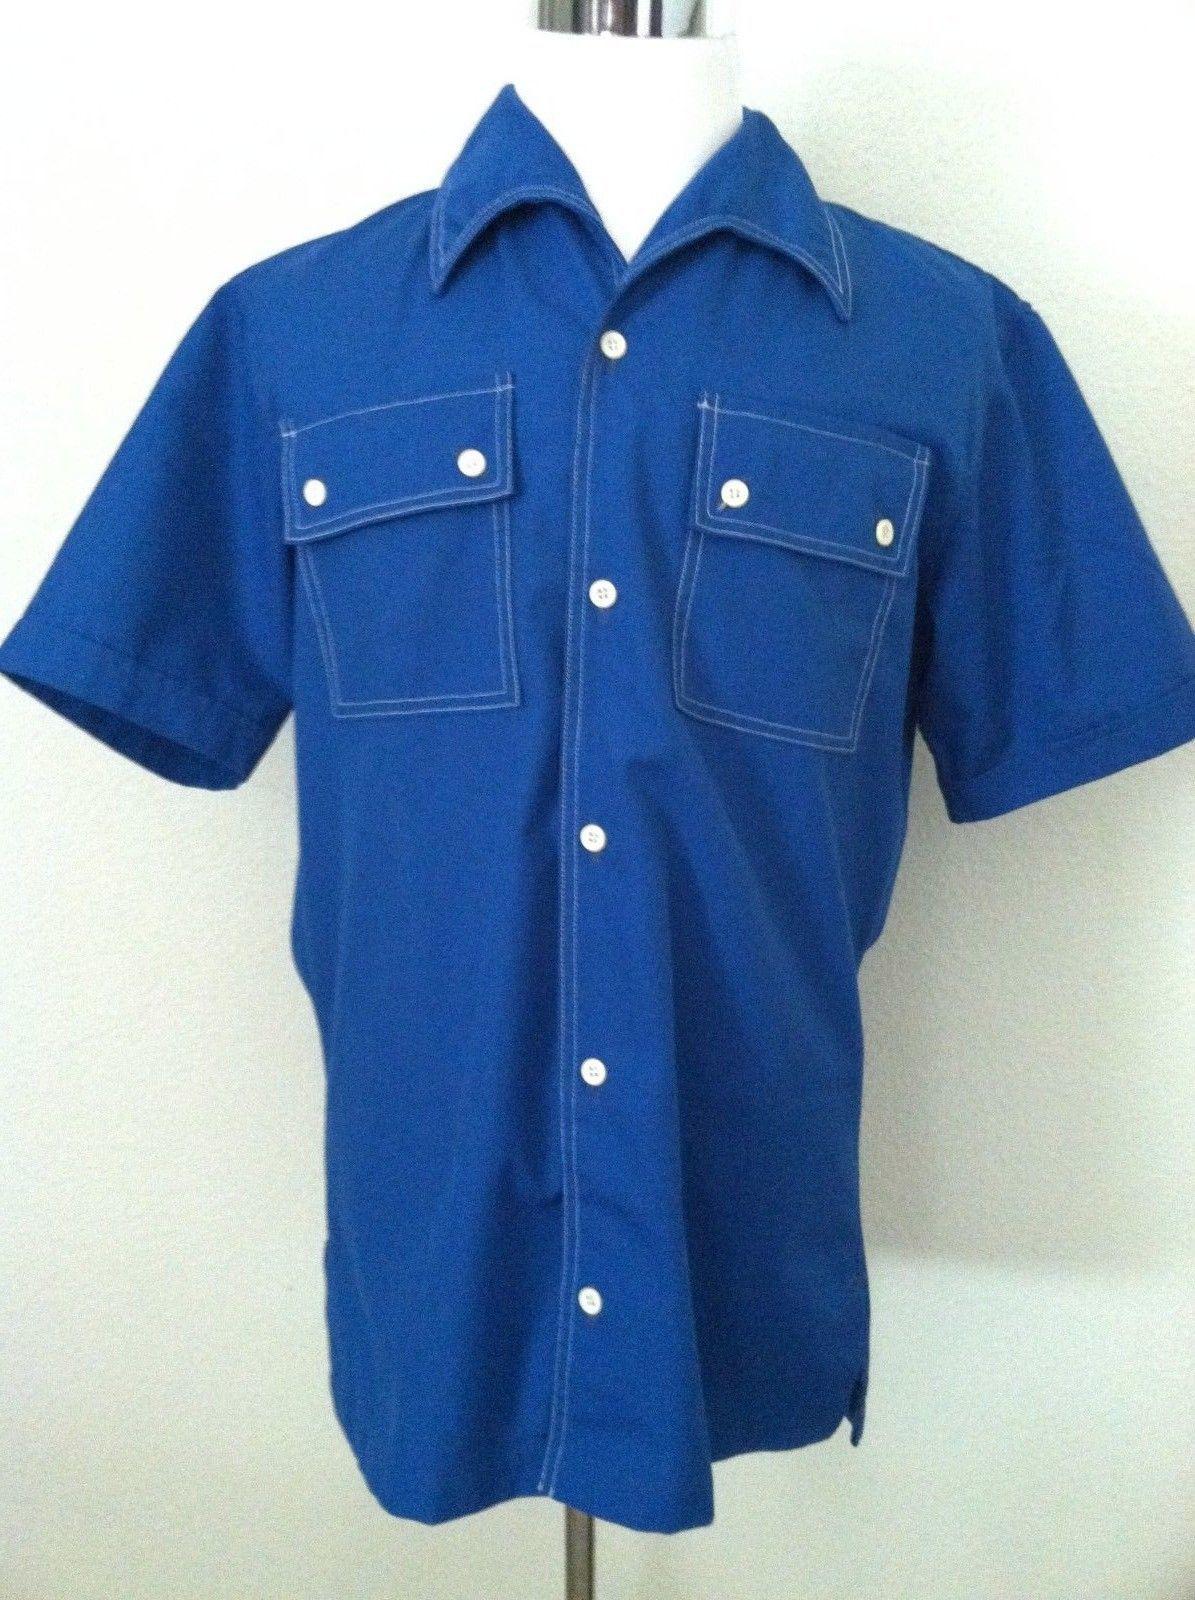 7119319a41e Vintage 60 men shirt button down blue short and 43 similar items